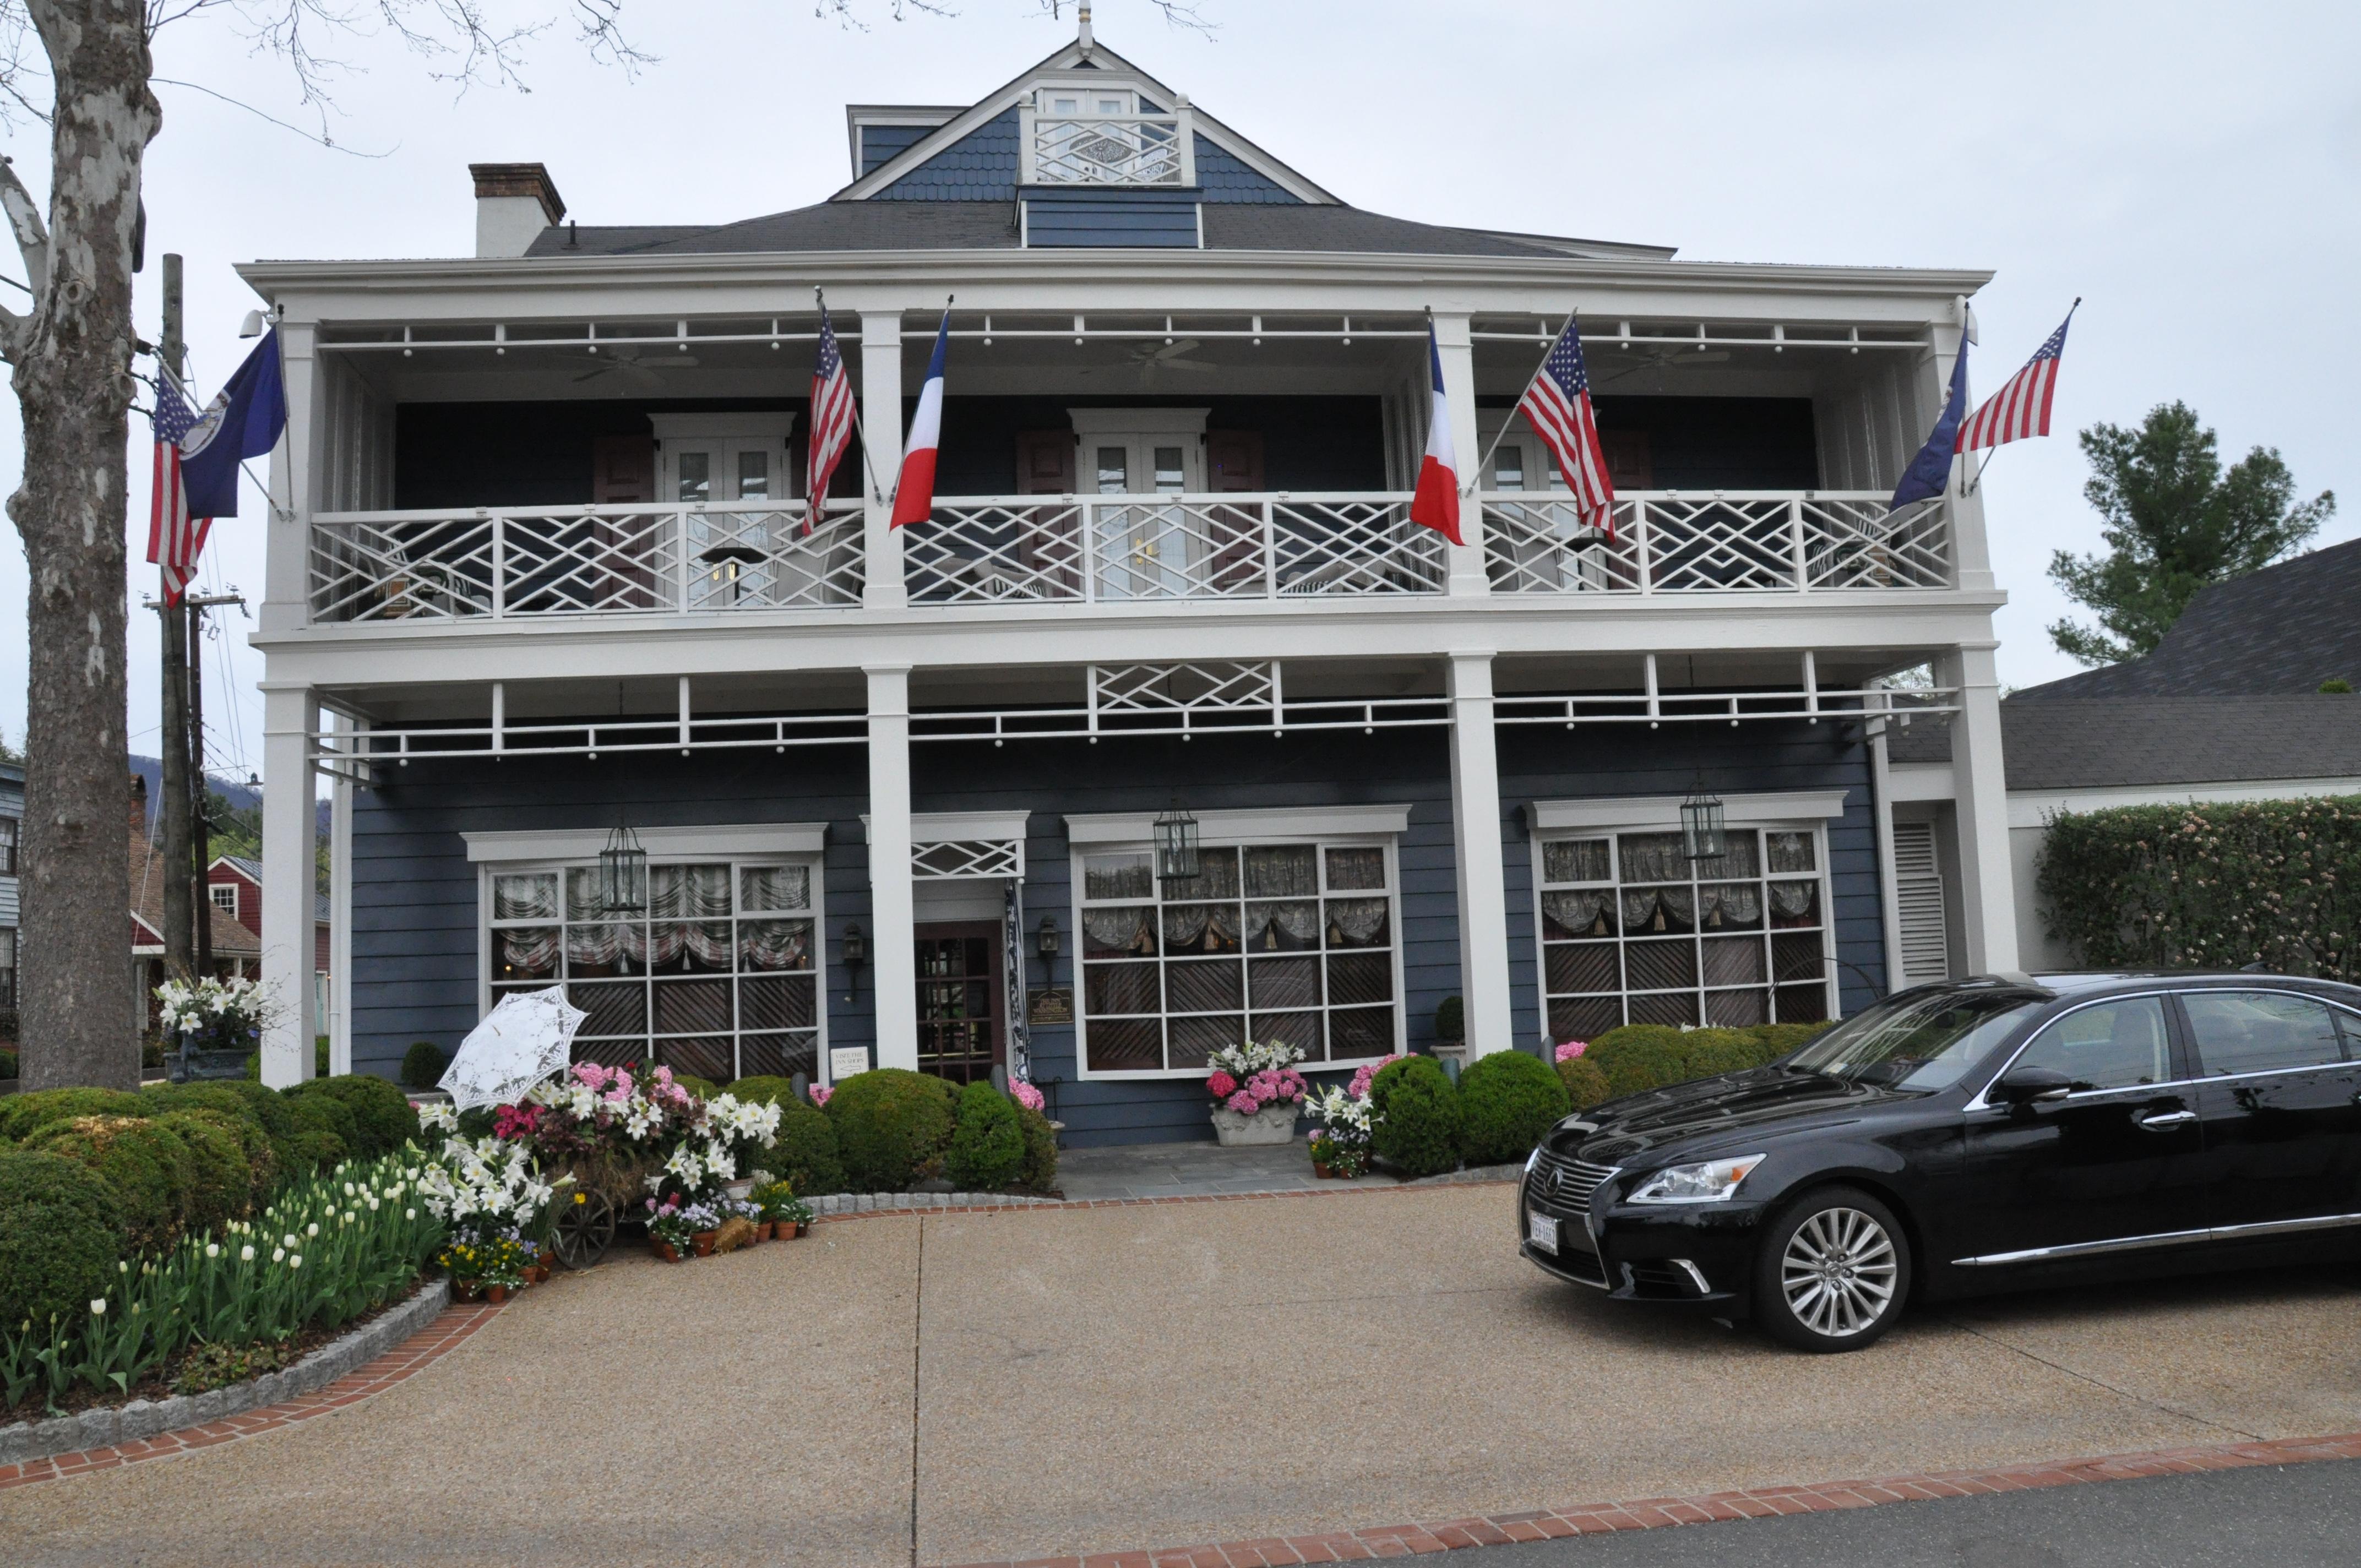 Virginia Leads OpenTables Most Romantic Restaurants